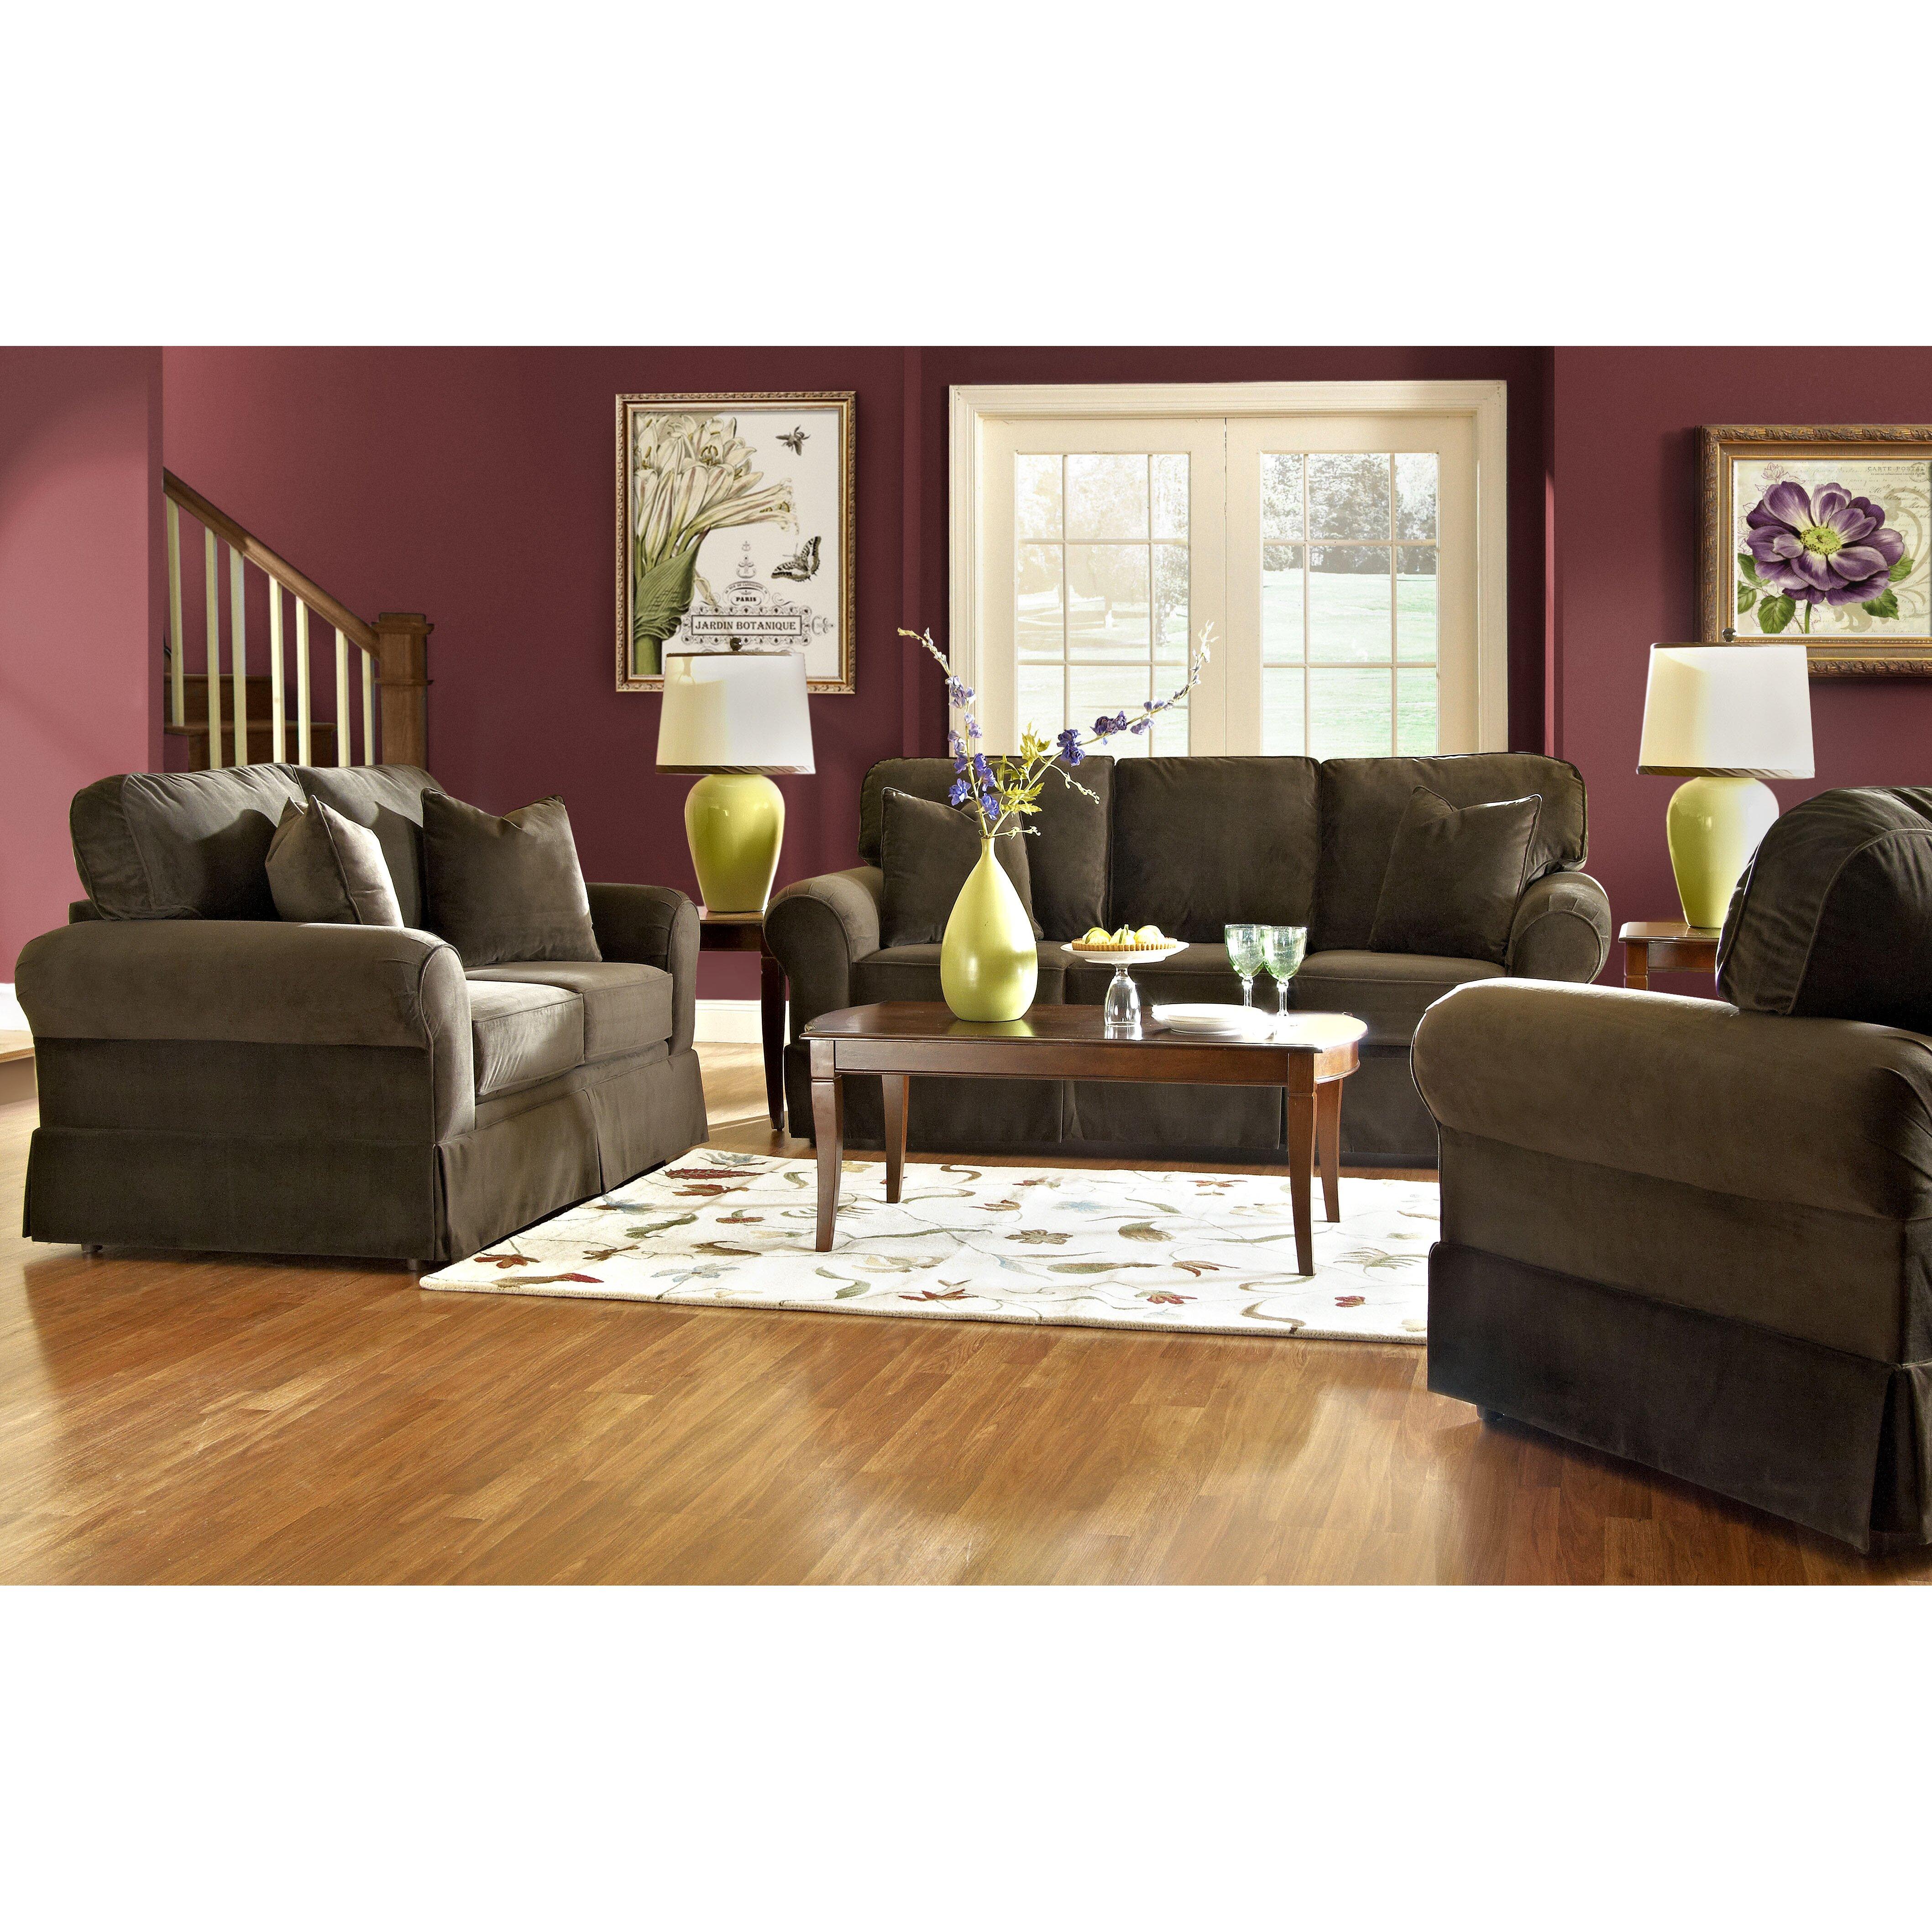 Klaussner Bedroom Furniture